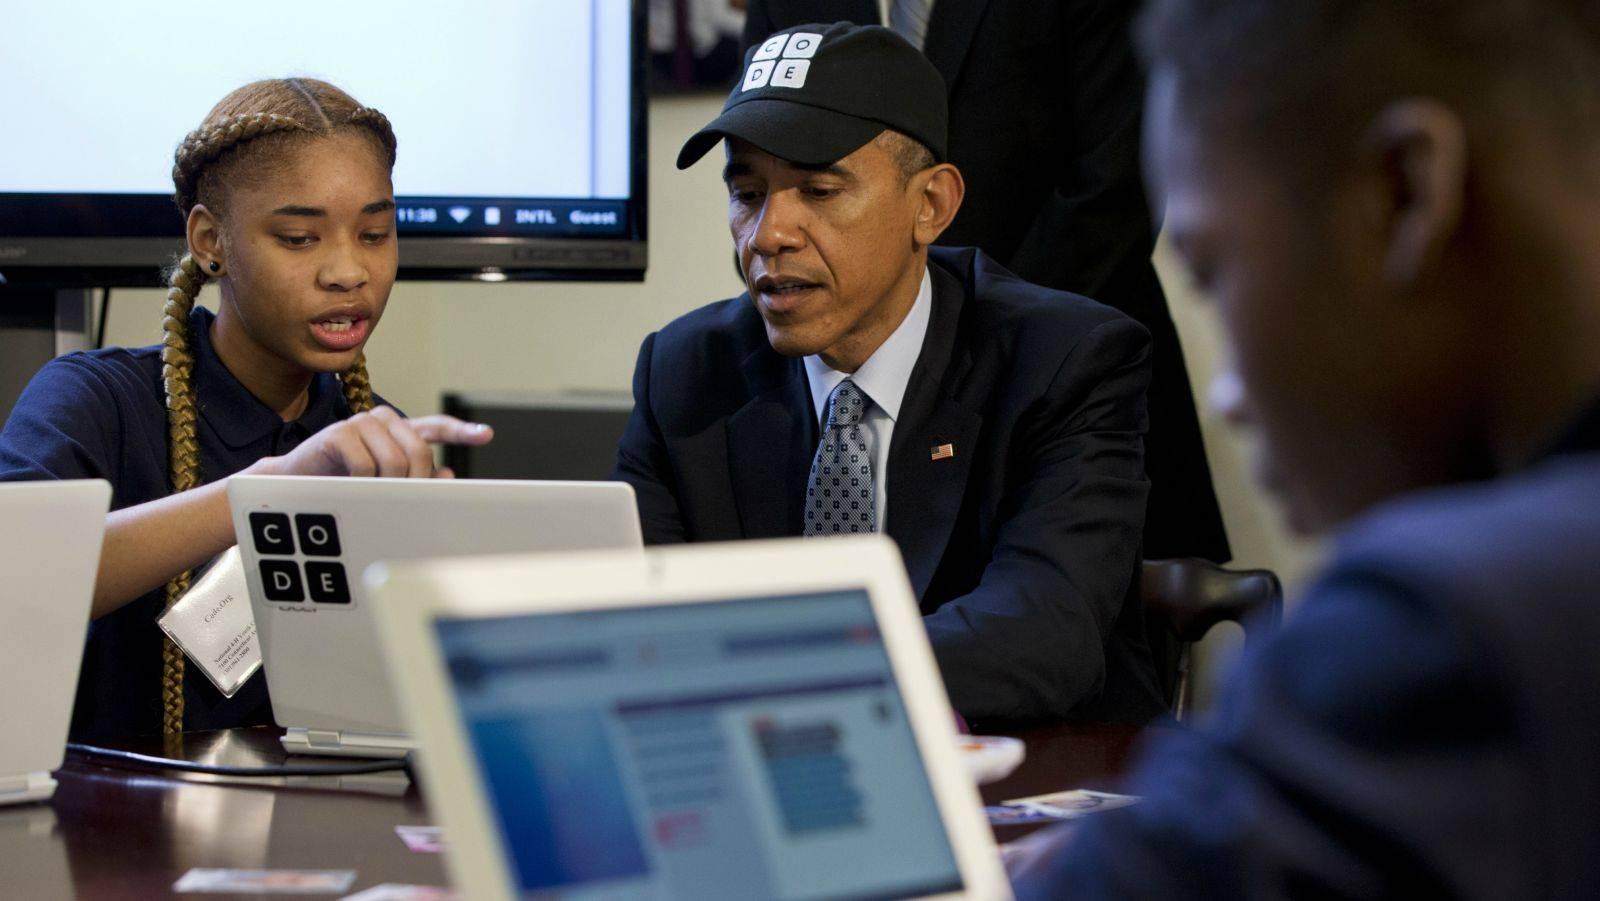 obama-coding